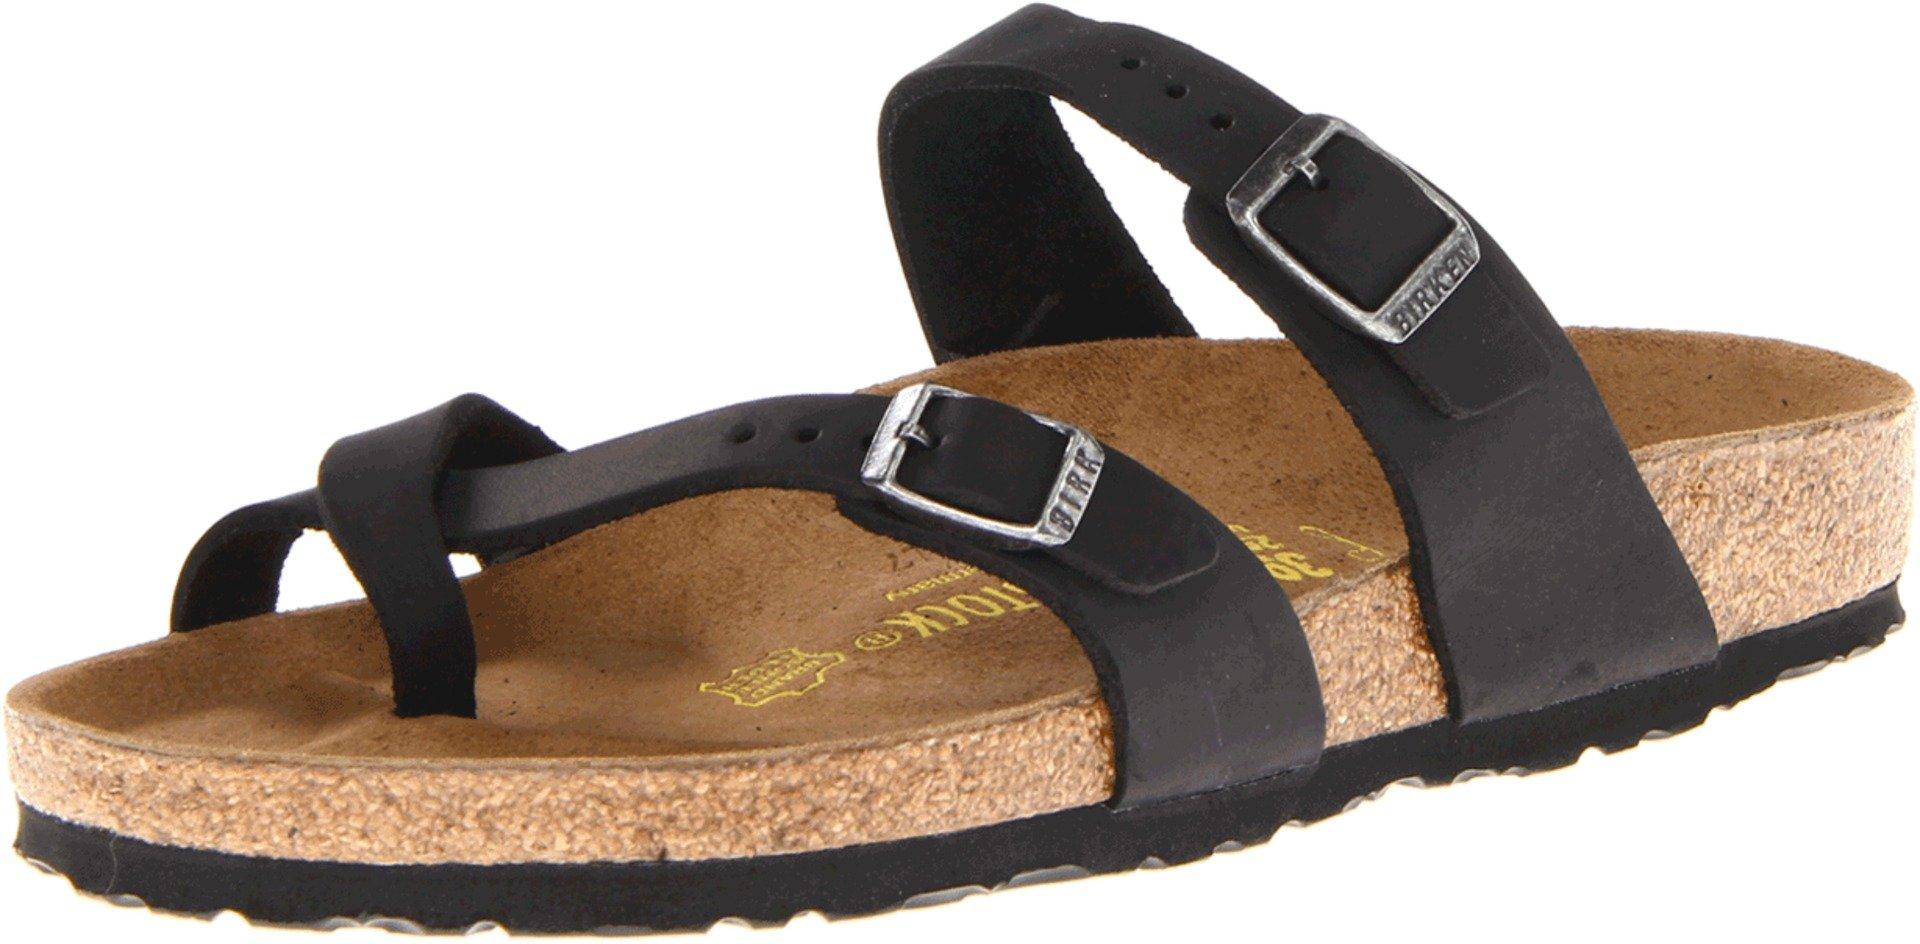 Birkenstock Women's Mayari Leather Thong Sandal,Black,EU Size 40 / Women's US Size 9-9.5